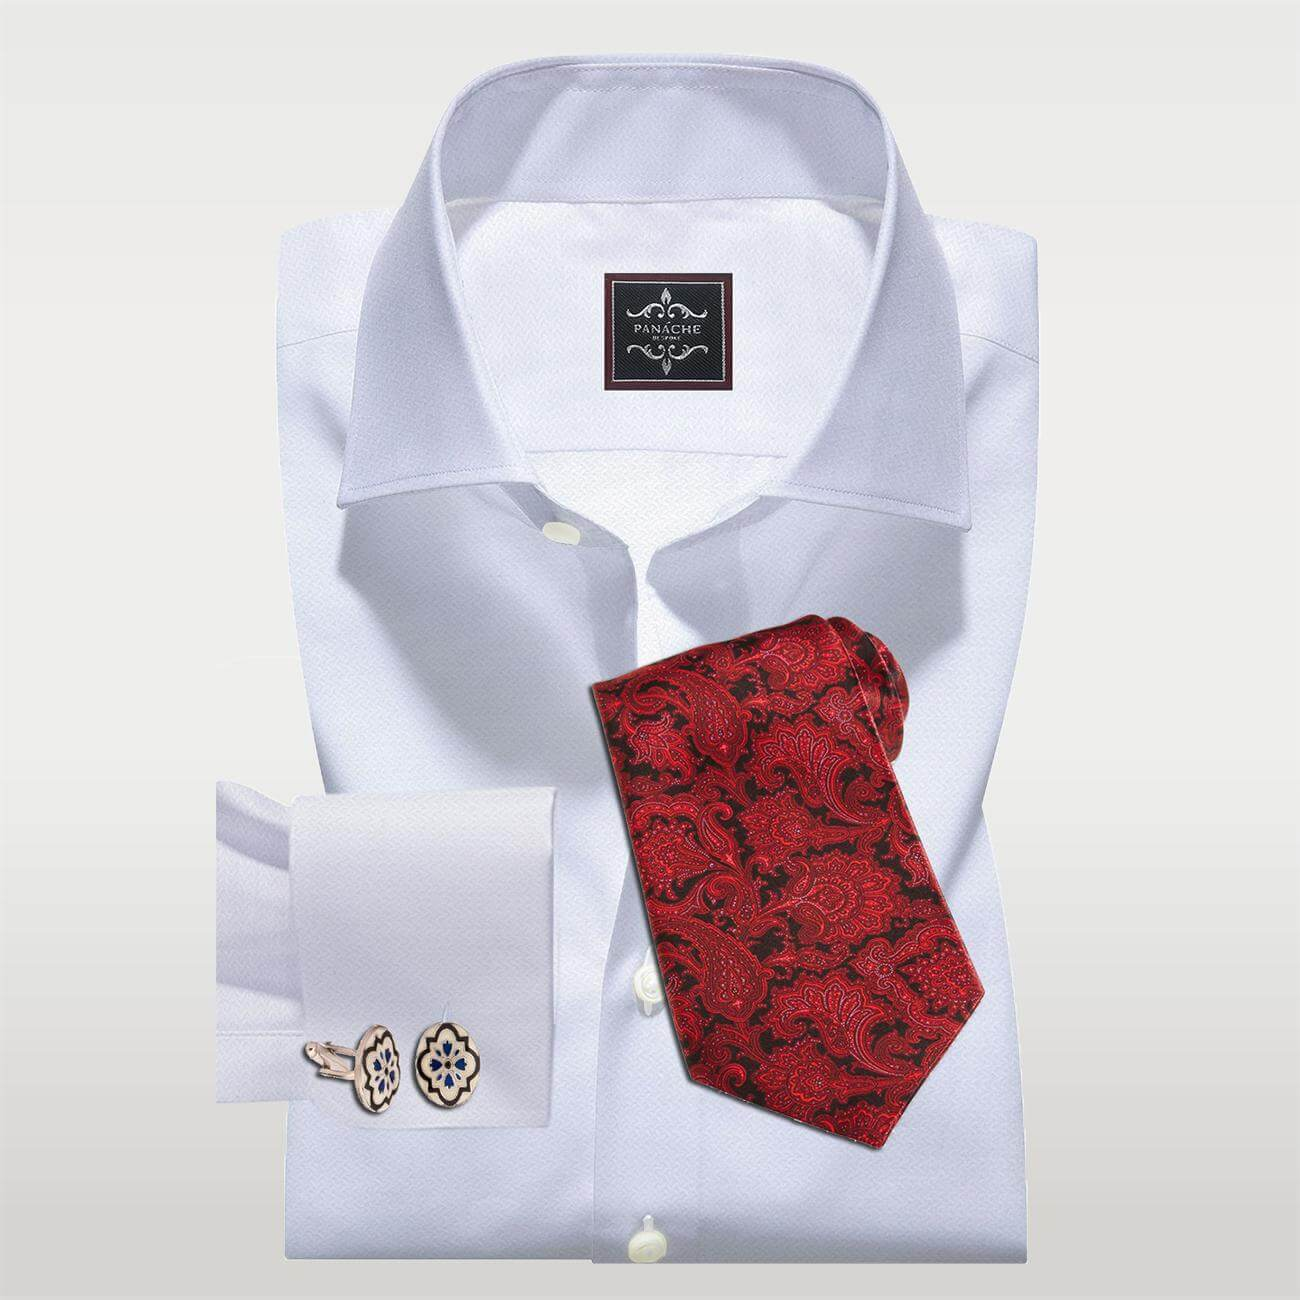 Luxury White Self Texture Twill Shirt